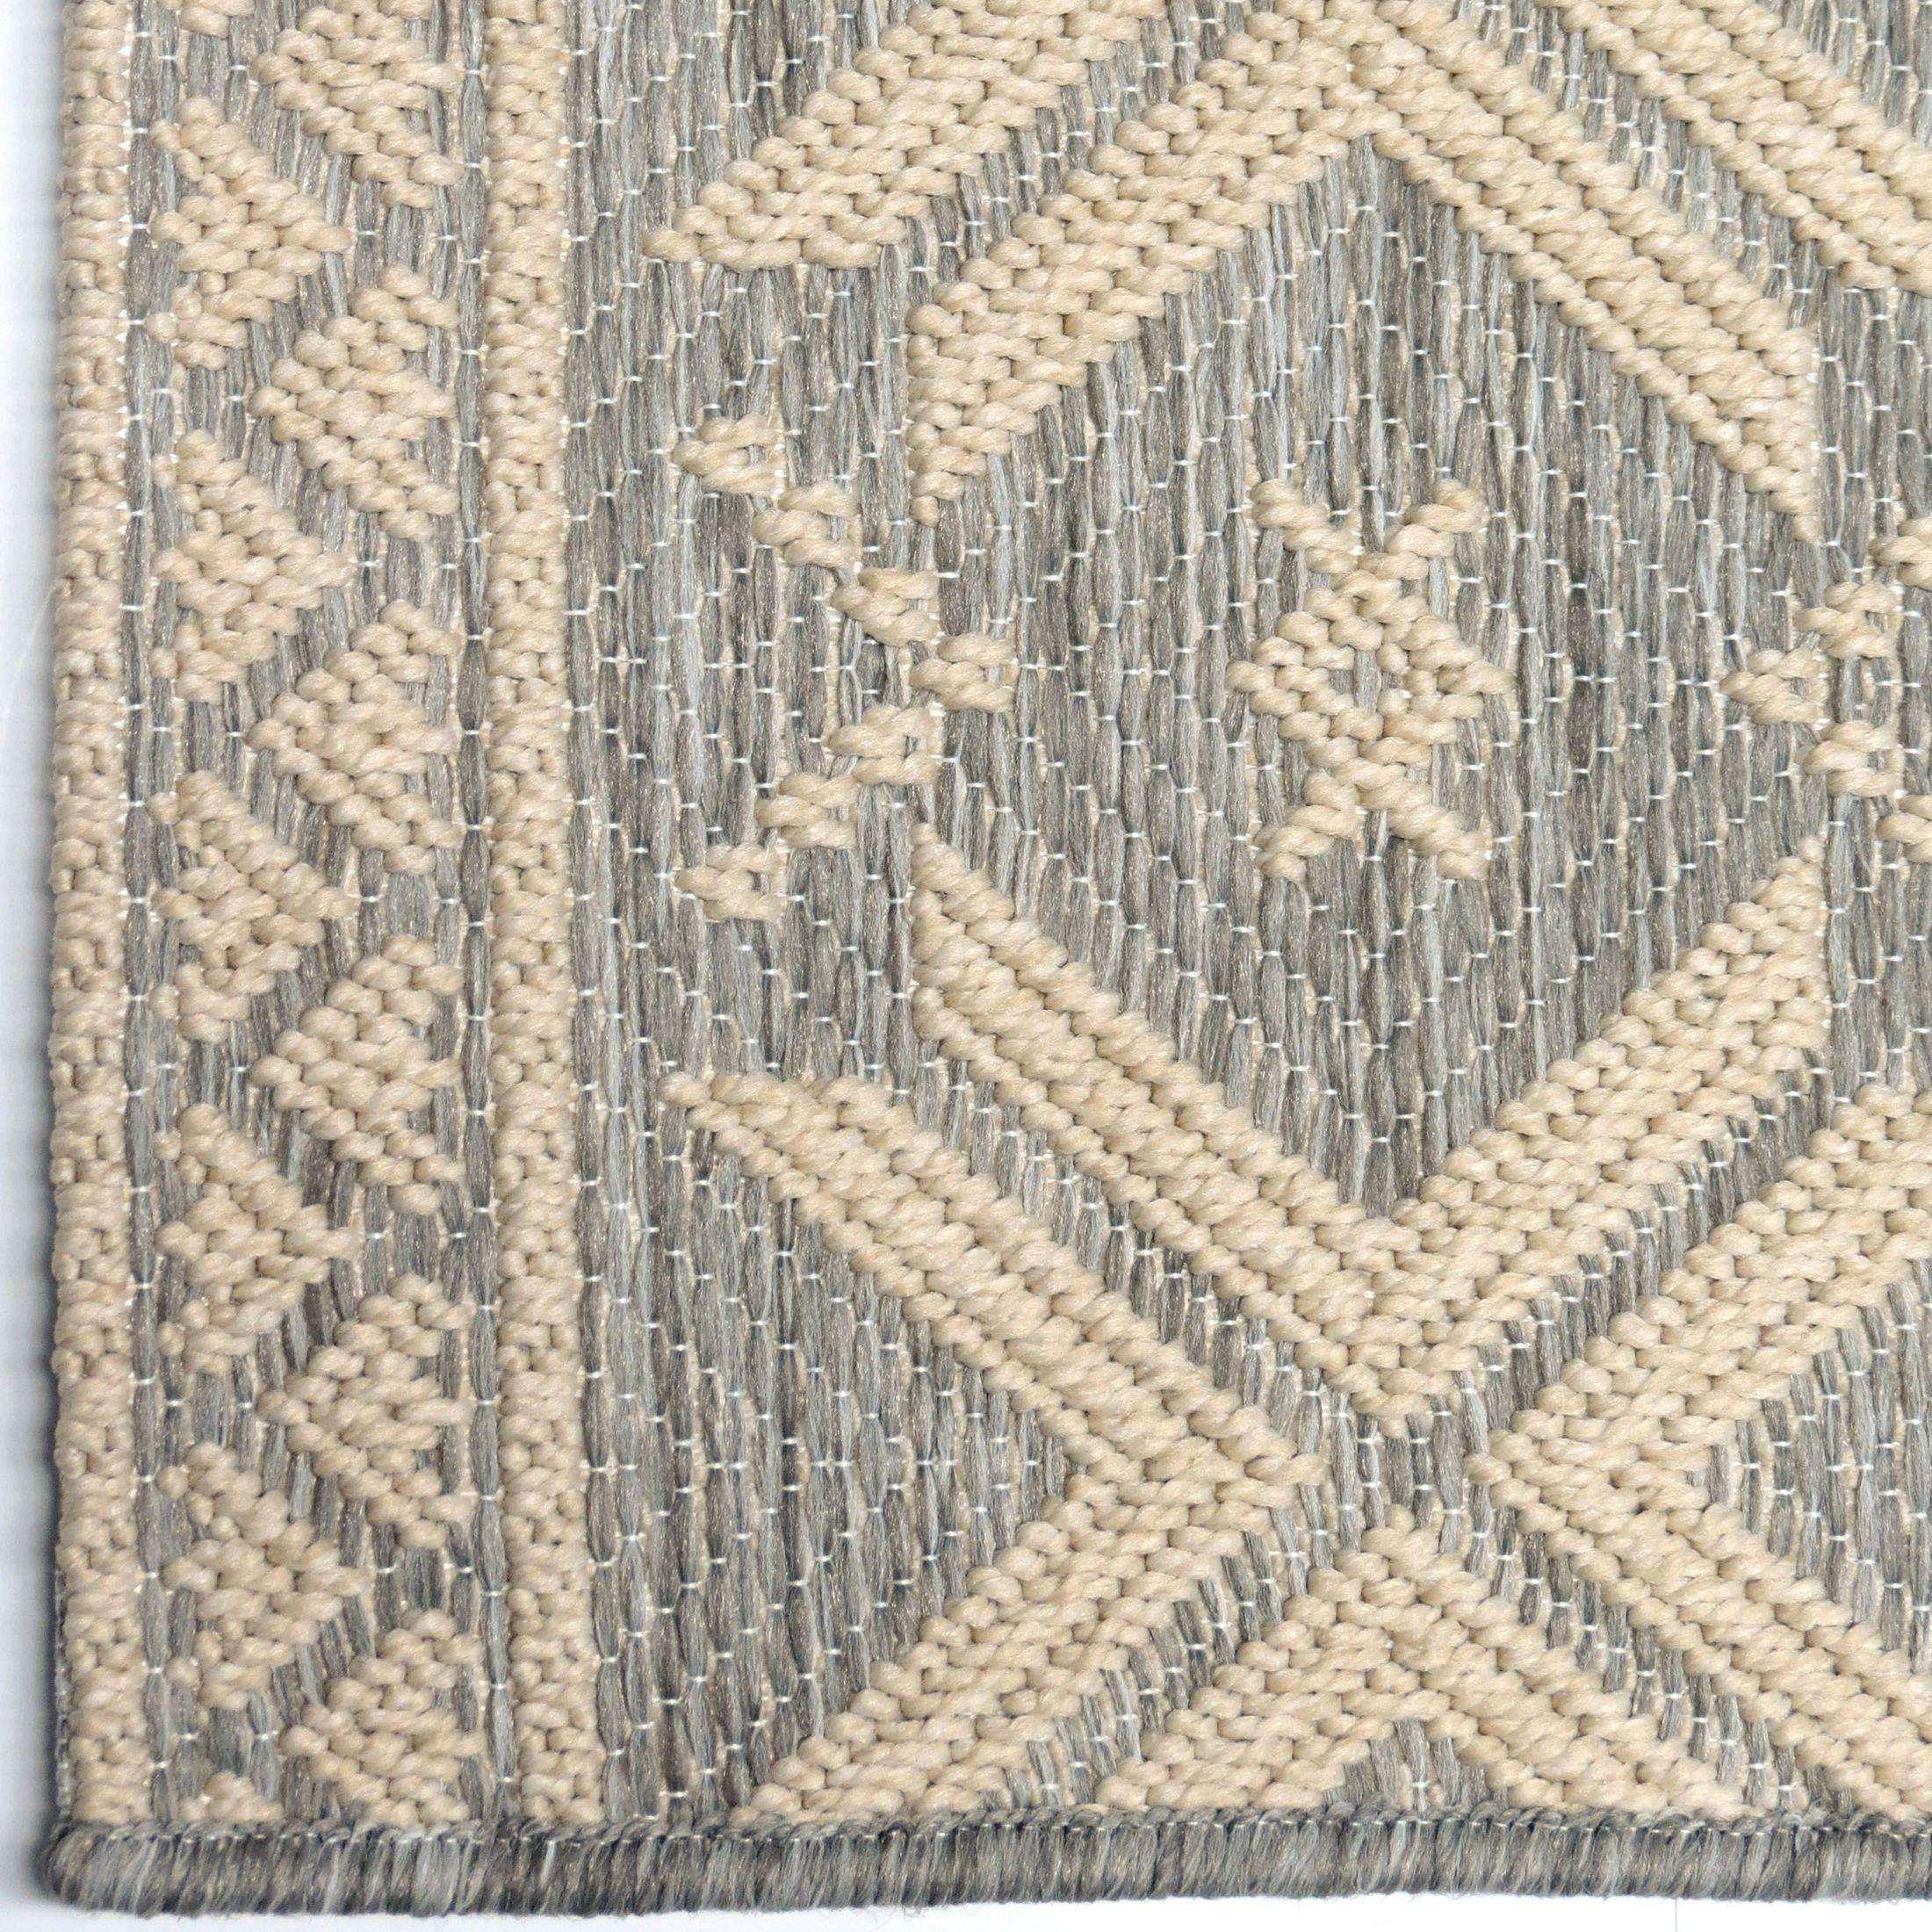 Gray Area Rug 8x11: Orian Rugs Indoor/ Outdoor Textured Cablecross Gray Area